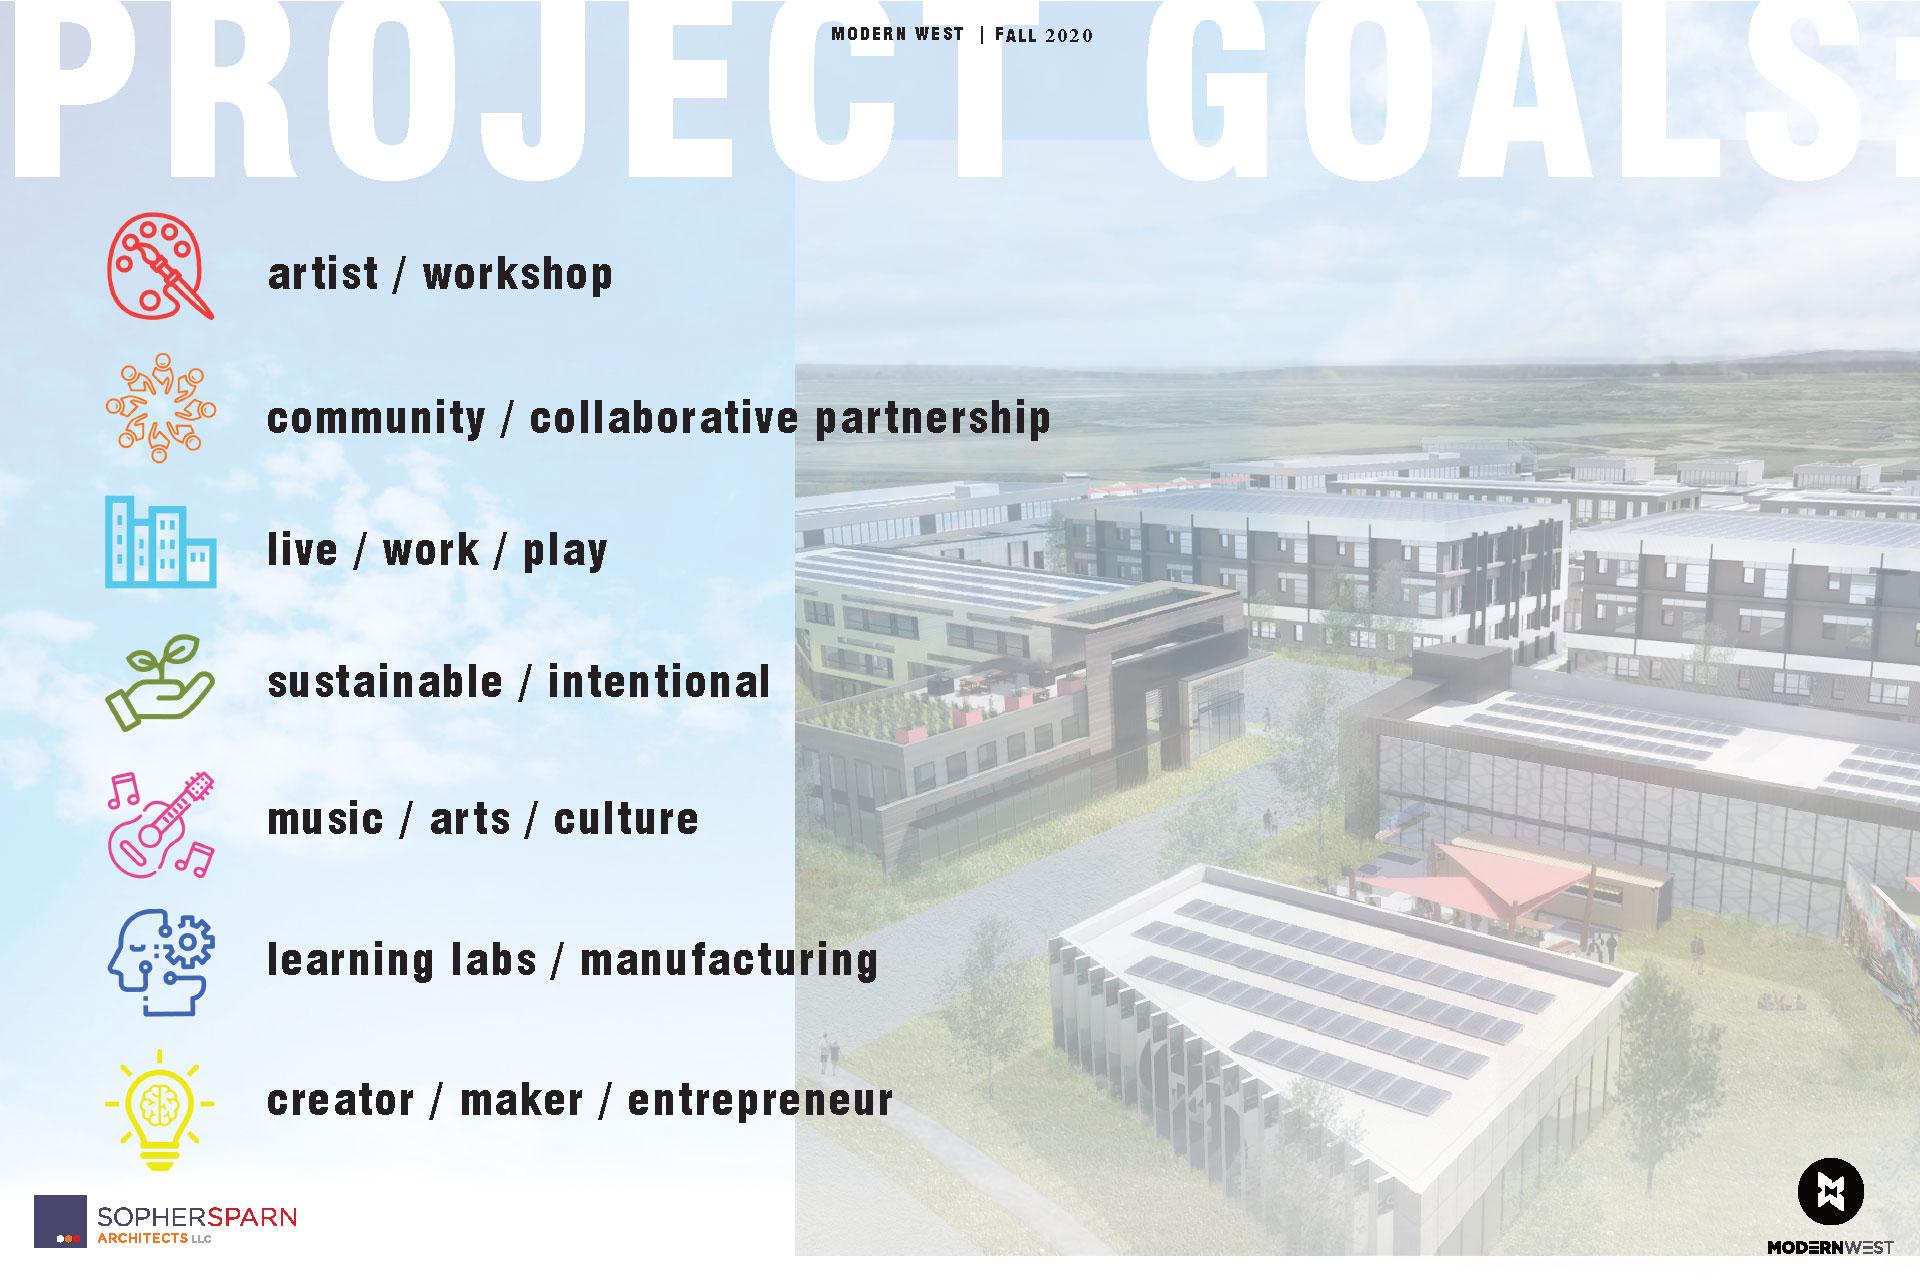 ModernWest project goals